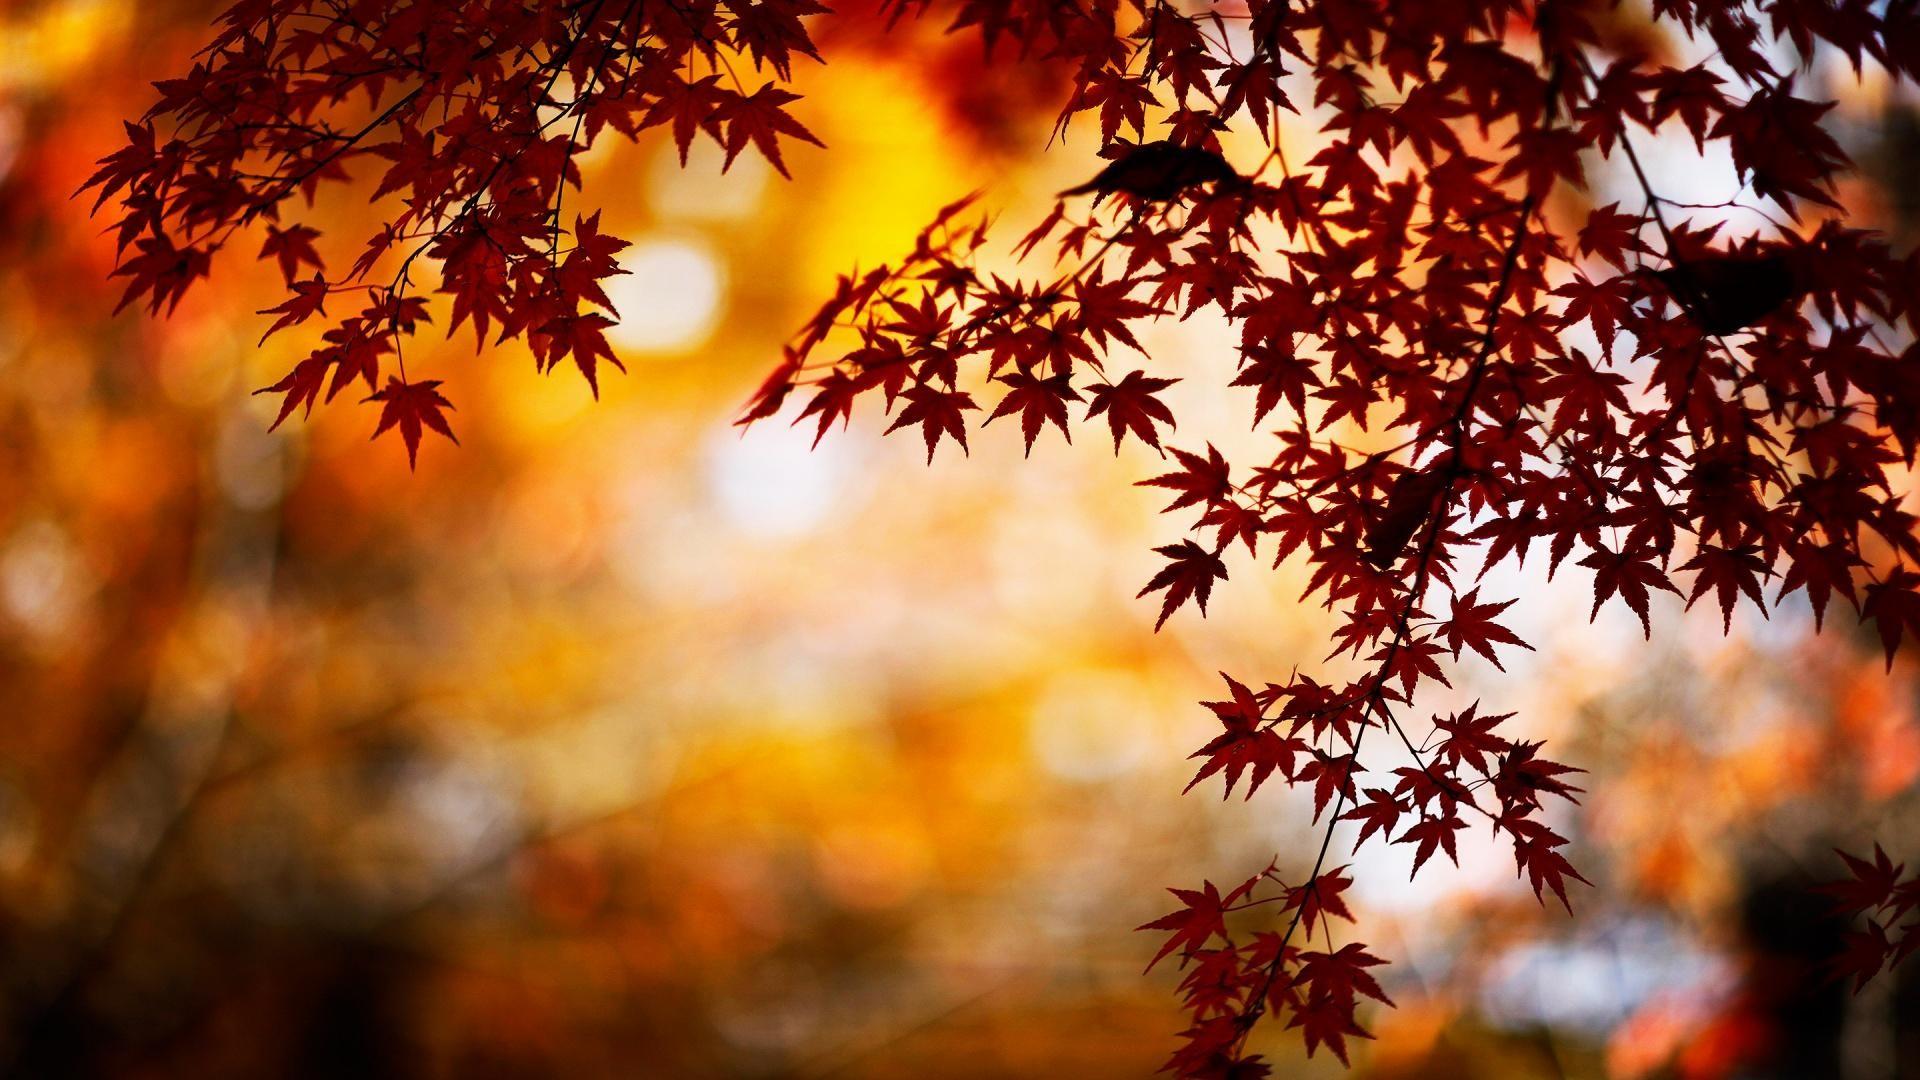 9. fall-foliage-wallpaper-for-desktop10-600×338